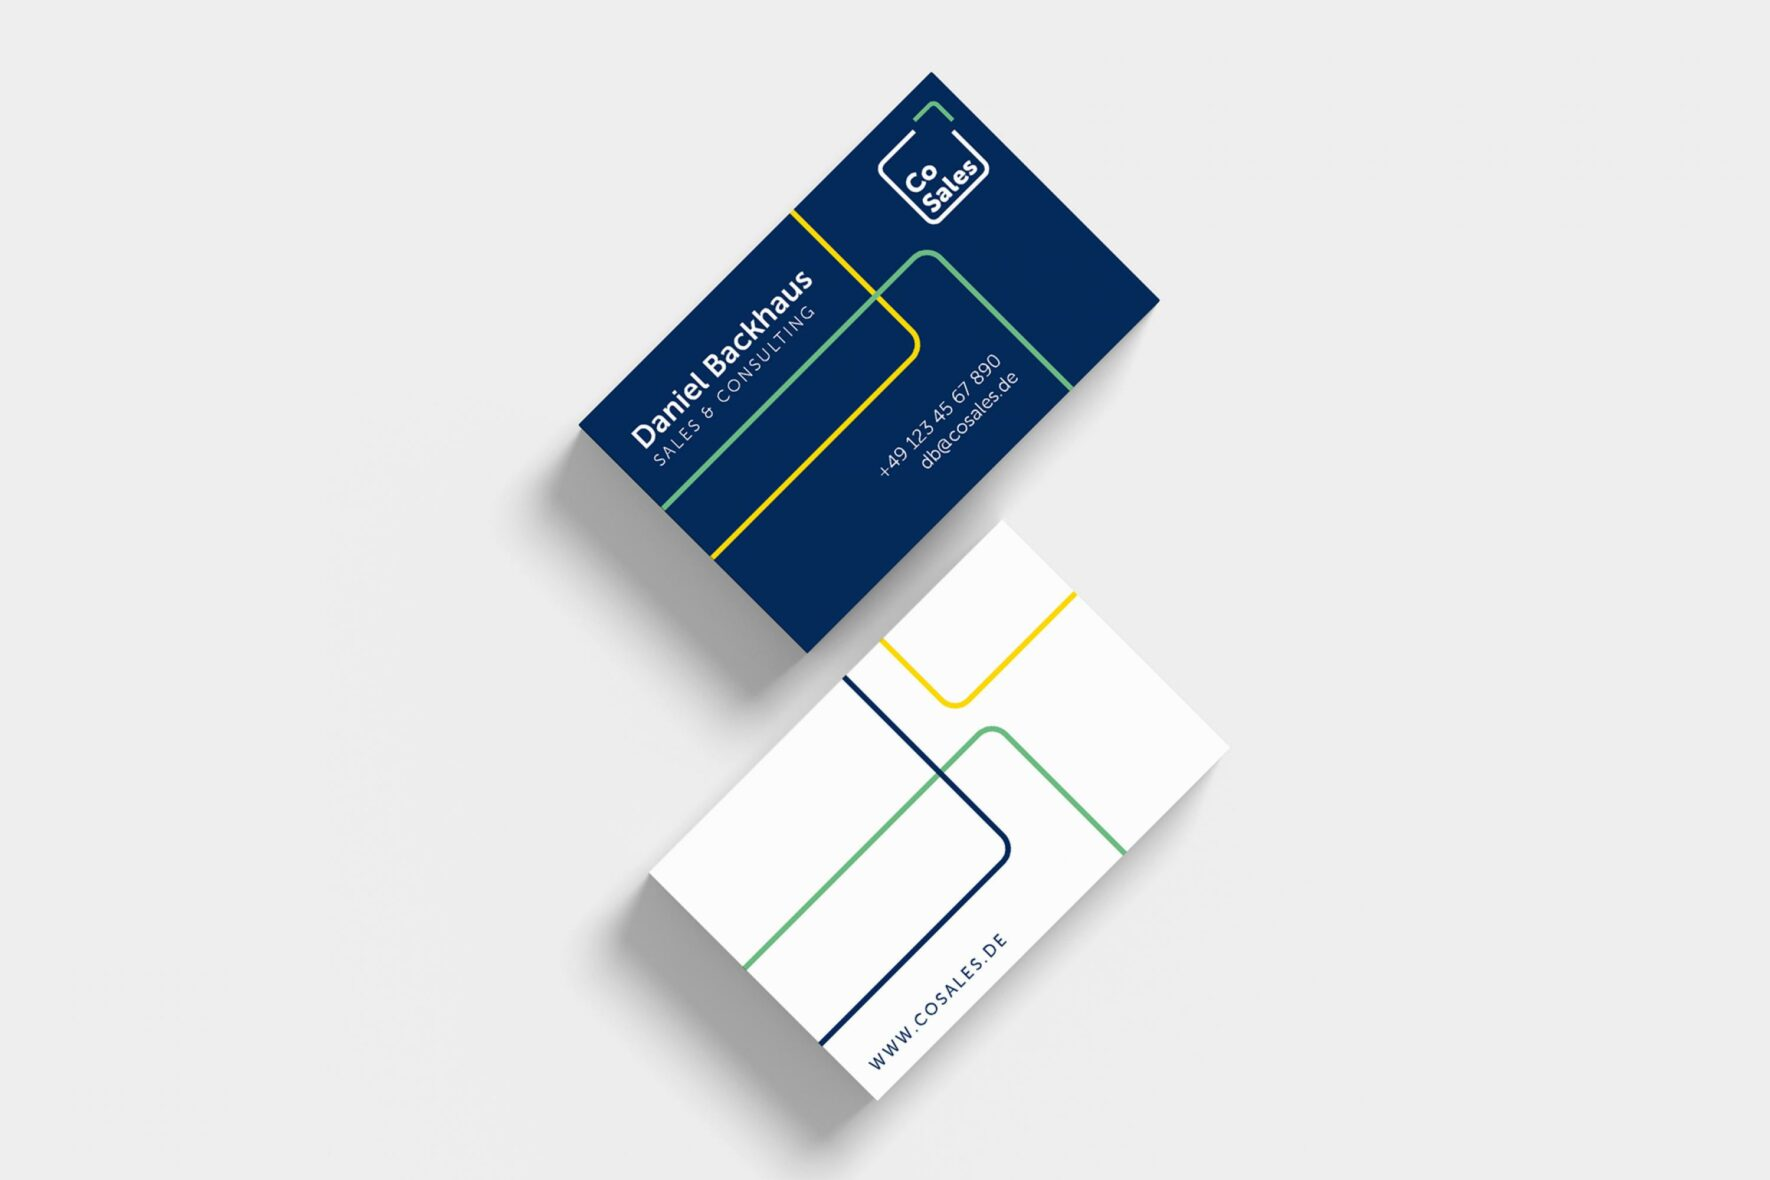 CoSales-Visitenkarten-Gestaltung-Corporate-Design-Print-FORMLOS-Berlin